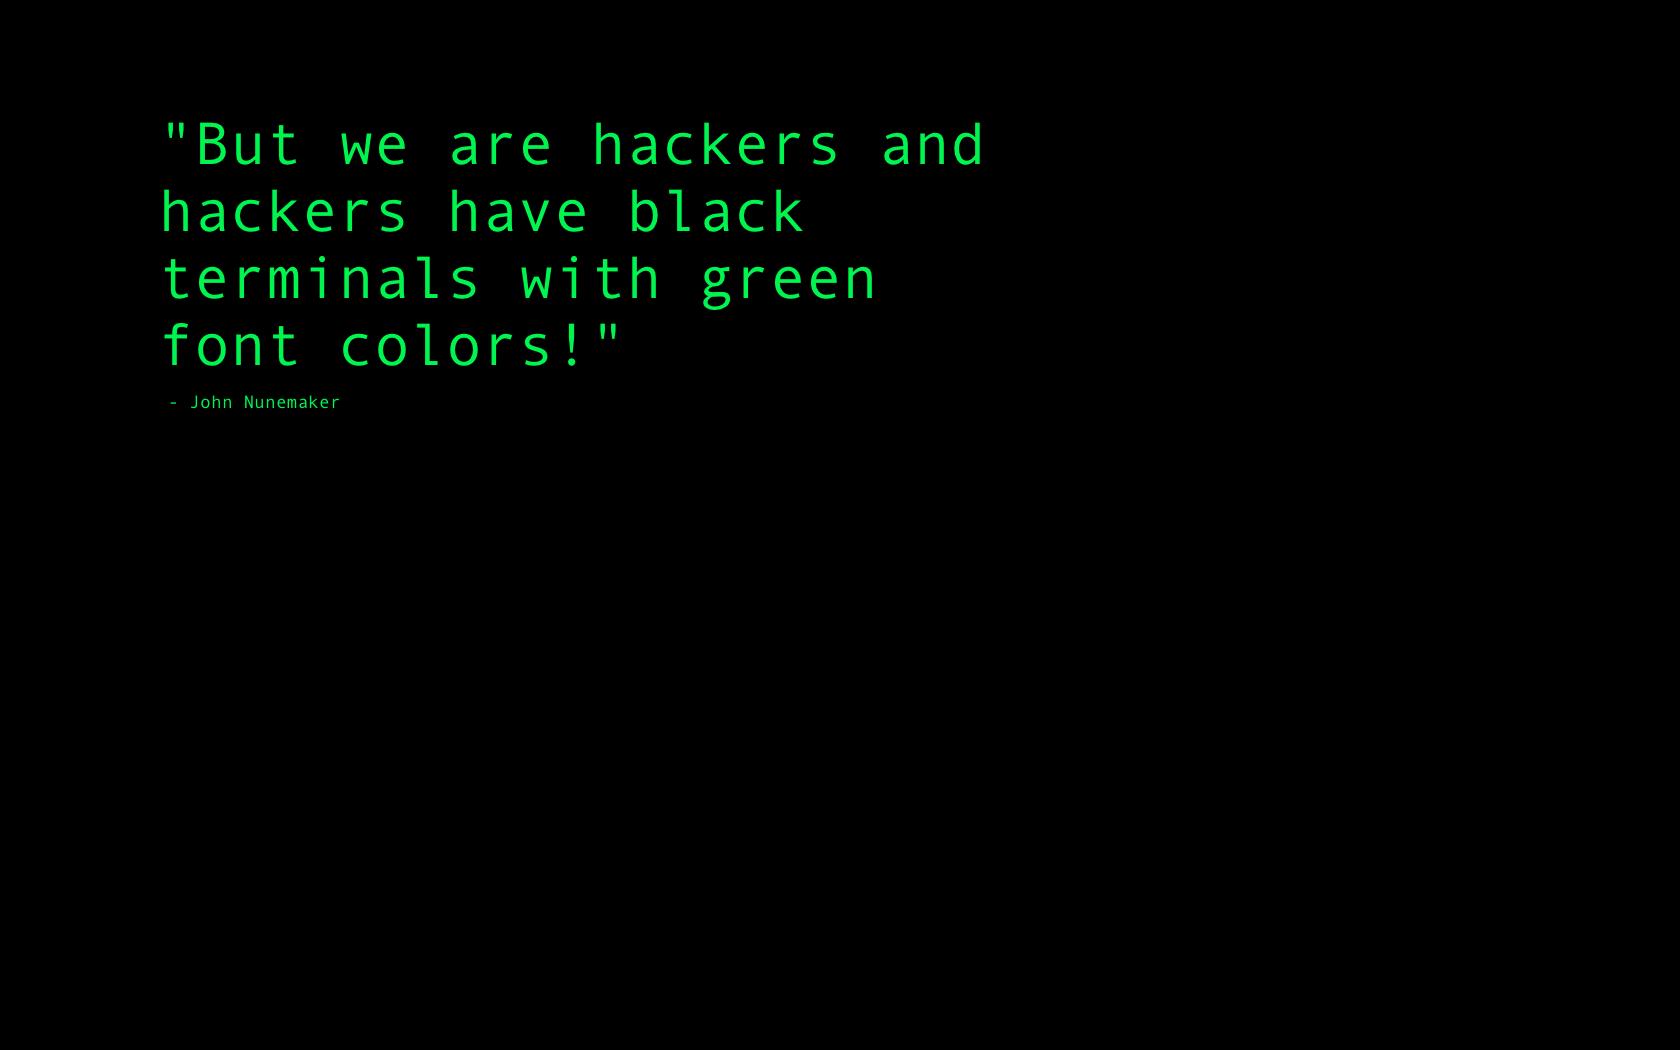 Hacker quote #3